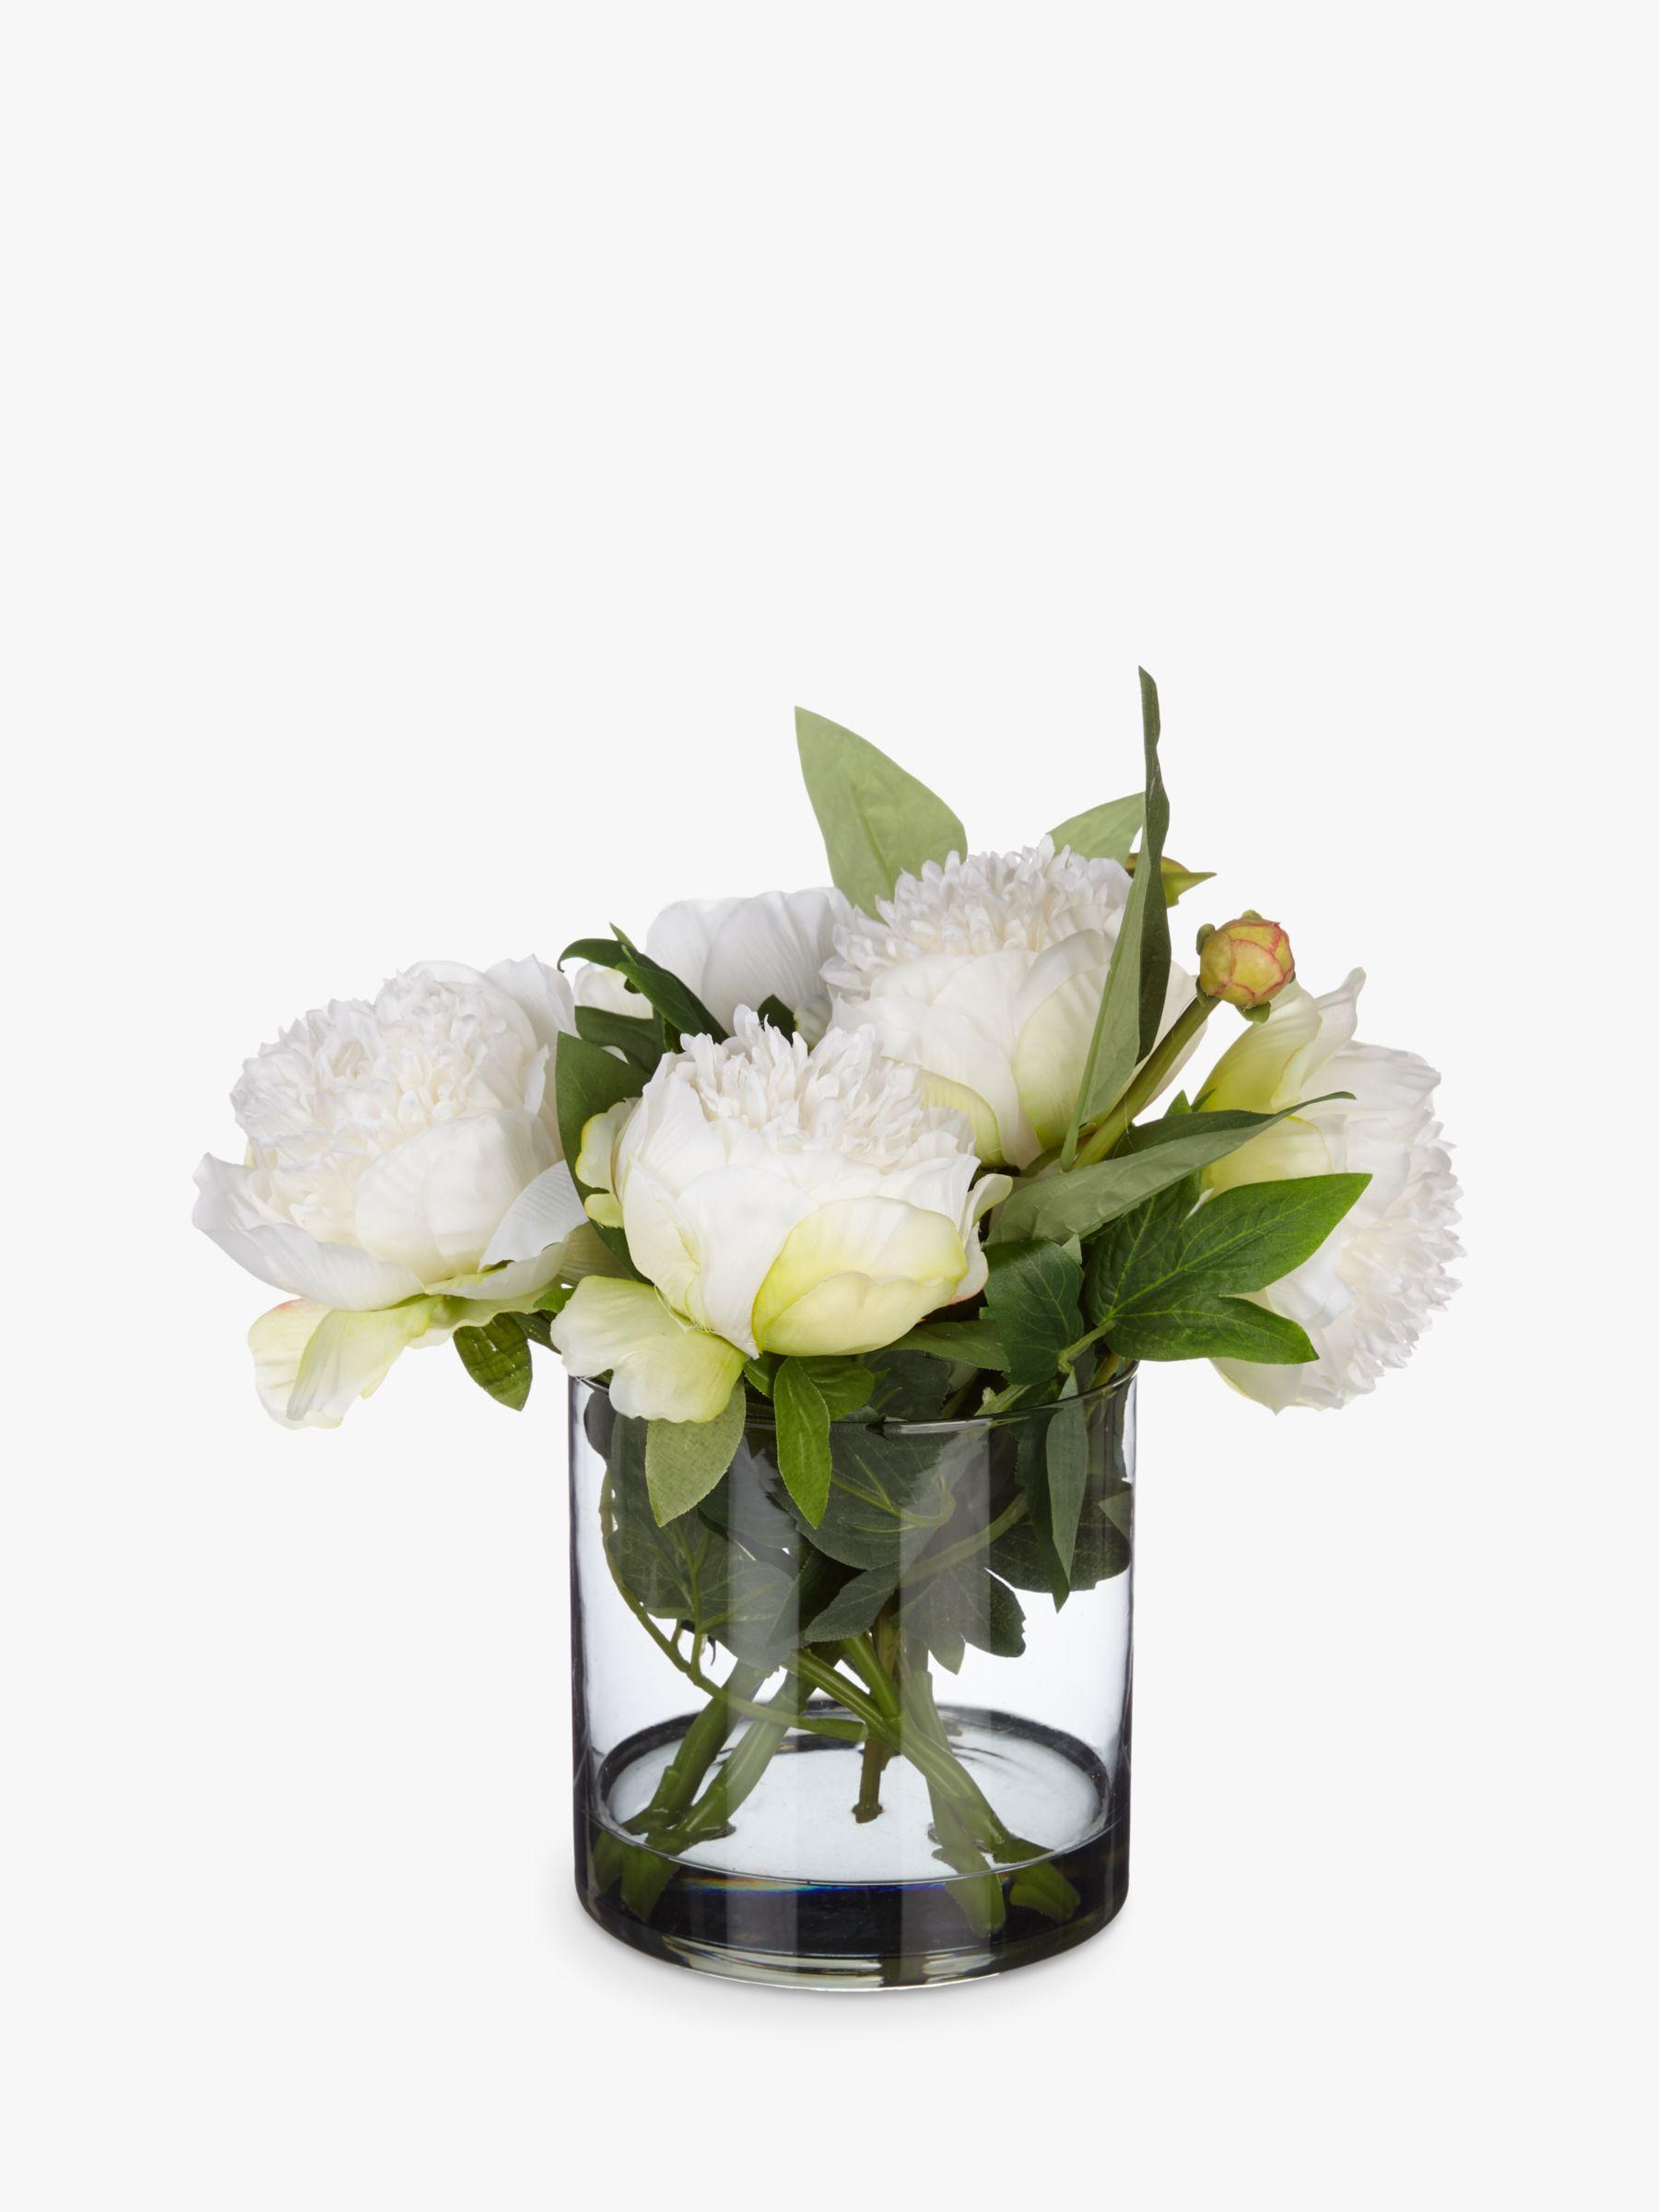 Peony Peony Peonies in Black Glass Cylinder Vase, White